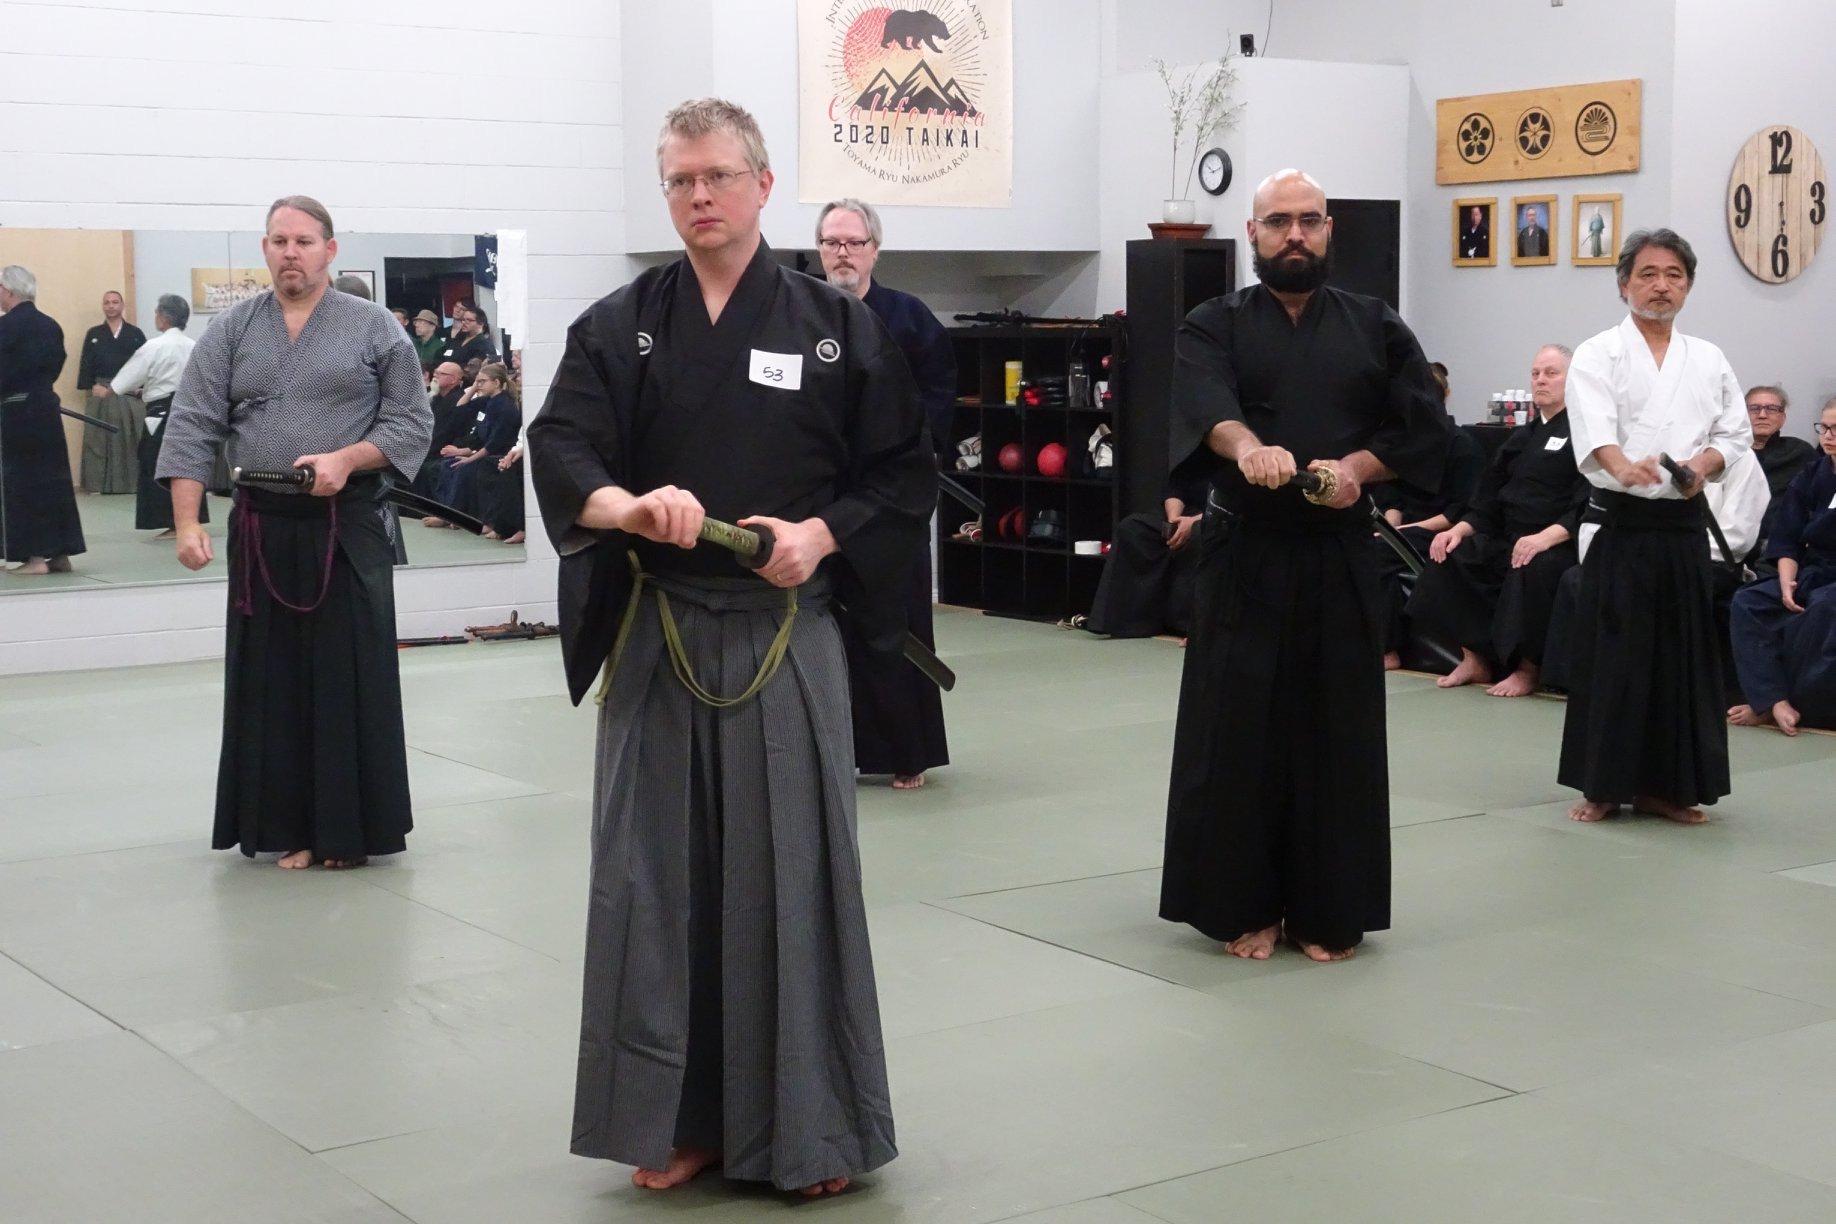 Taikai Toyama Ryu Embu - 4 and 5 Dans from Australia, San Diego, D.C., Maryland and Kenshinkan.